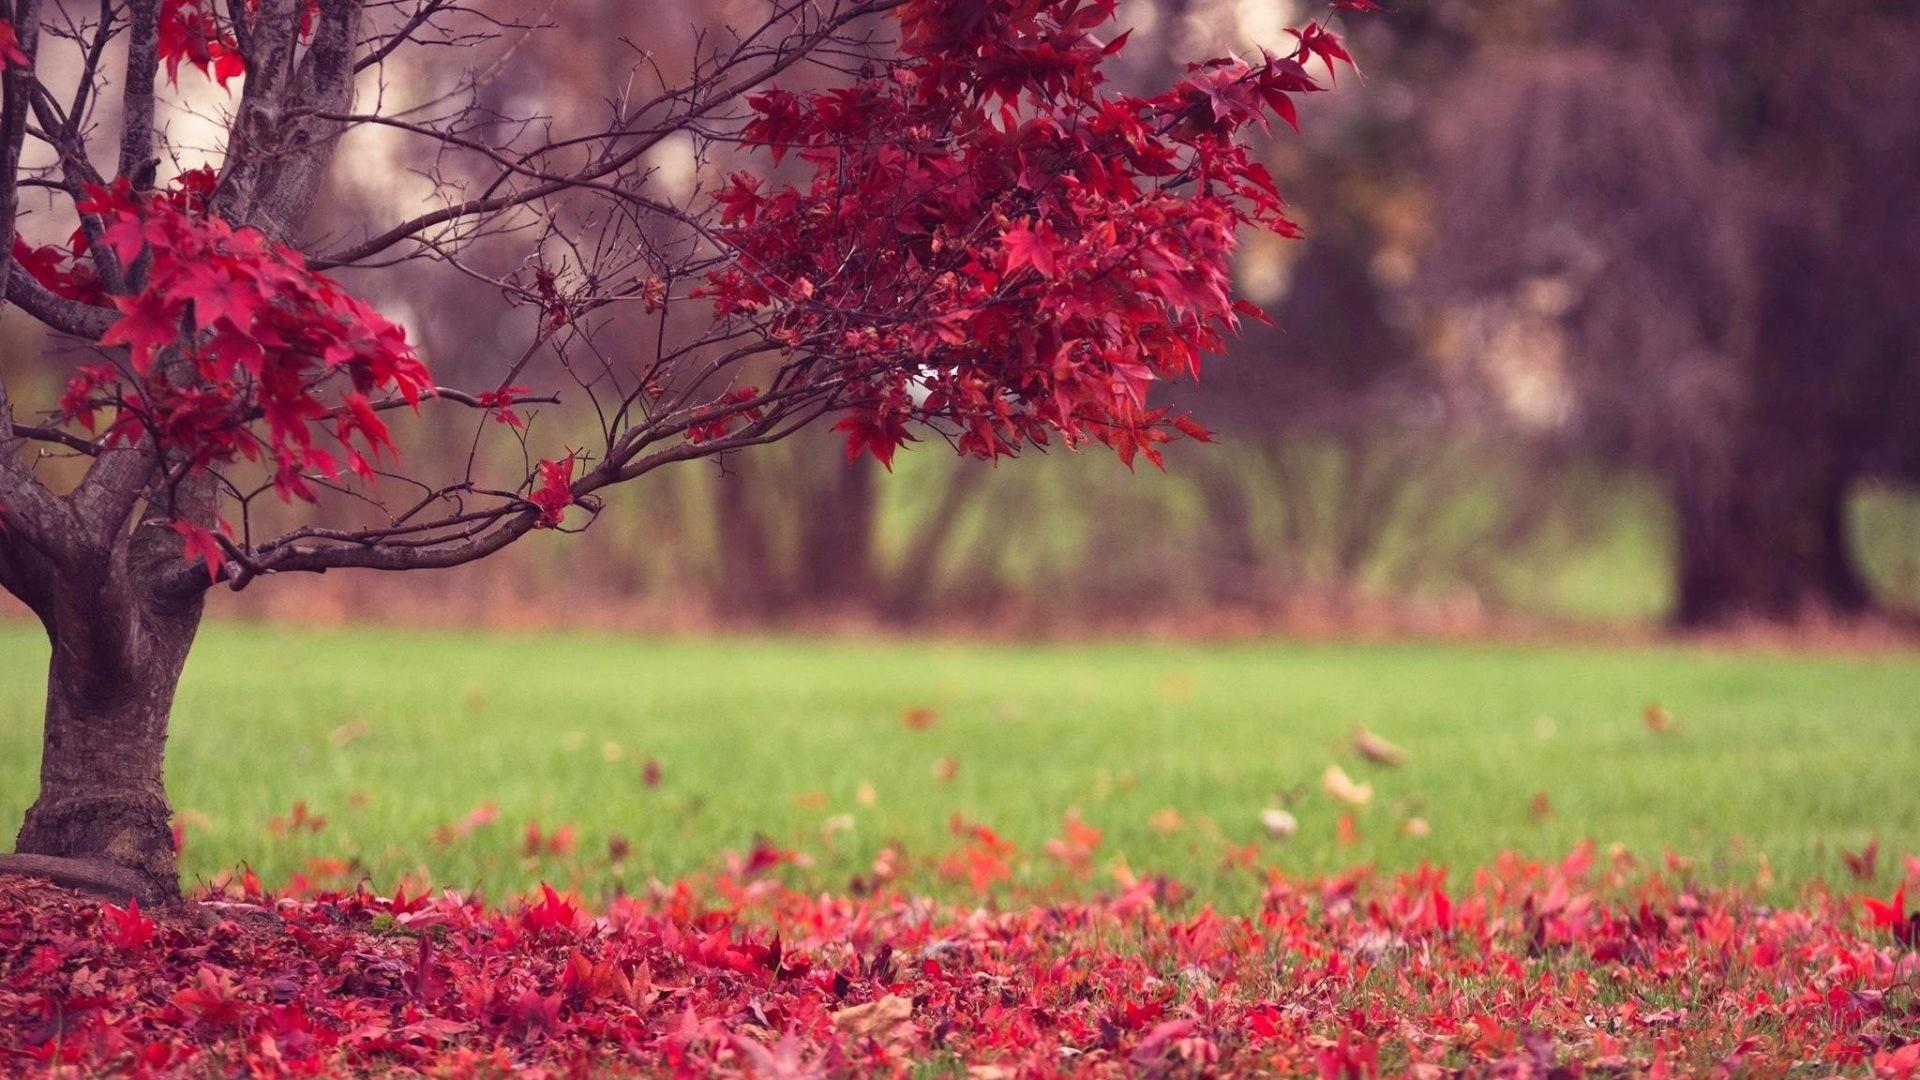 Autumn Screen Wallpapers Hd Wallpaper Collections 4kwallpaper Wiki